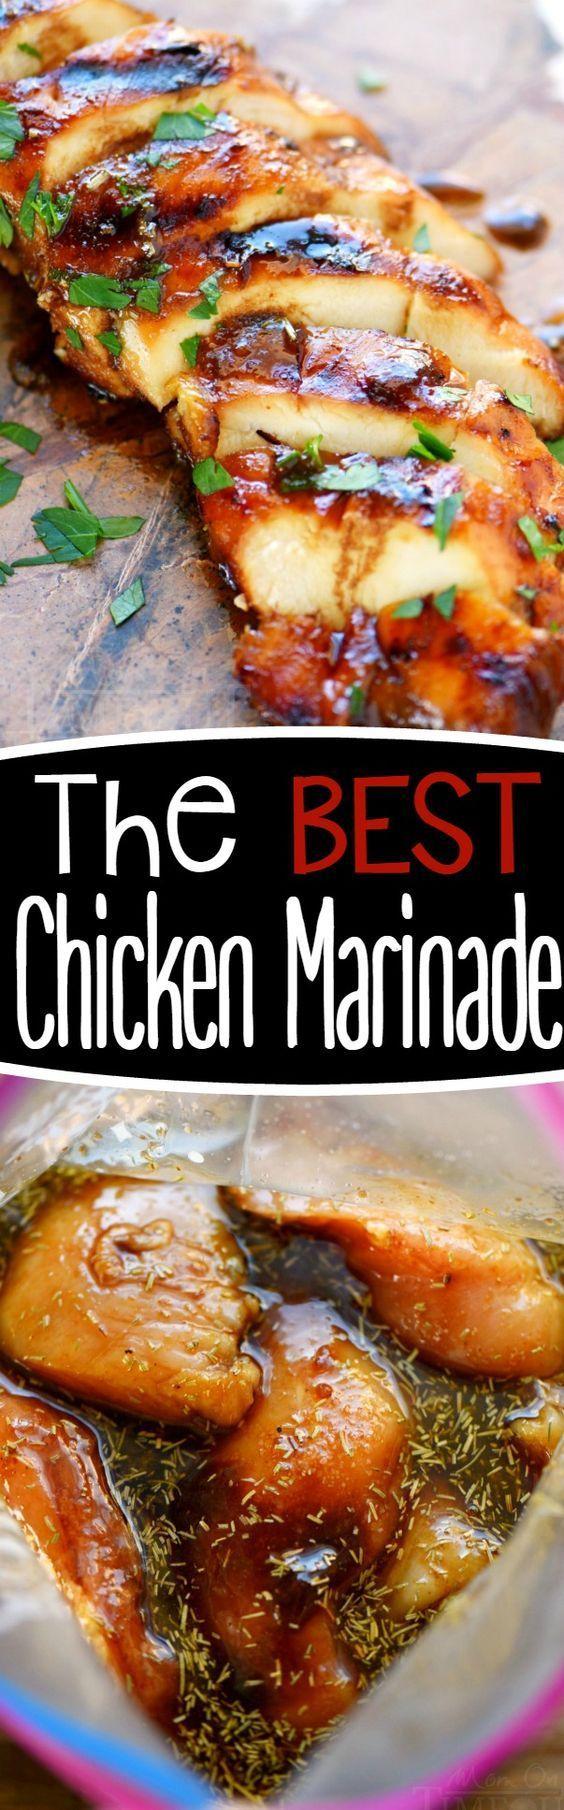 ☑️ Best Chicken Marinade (used this marinade on drumsticks and 1 chicken breast)